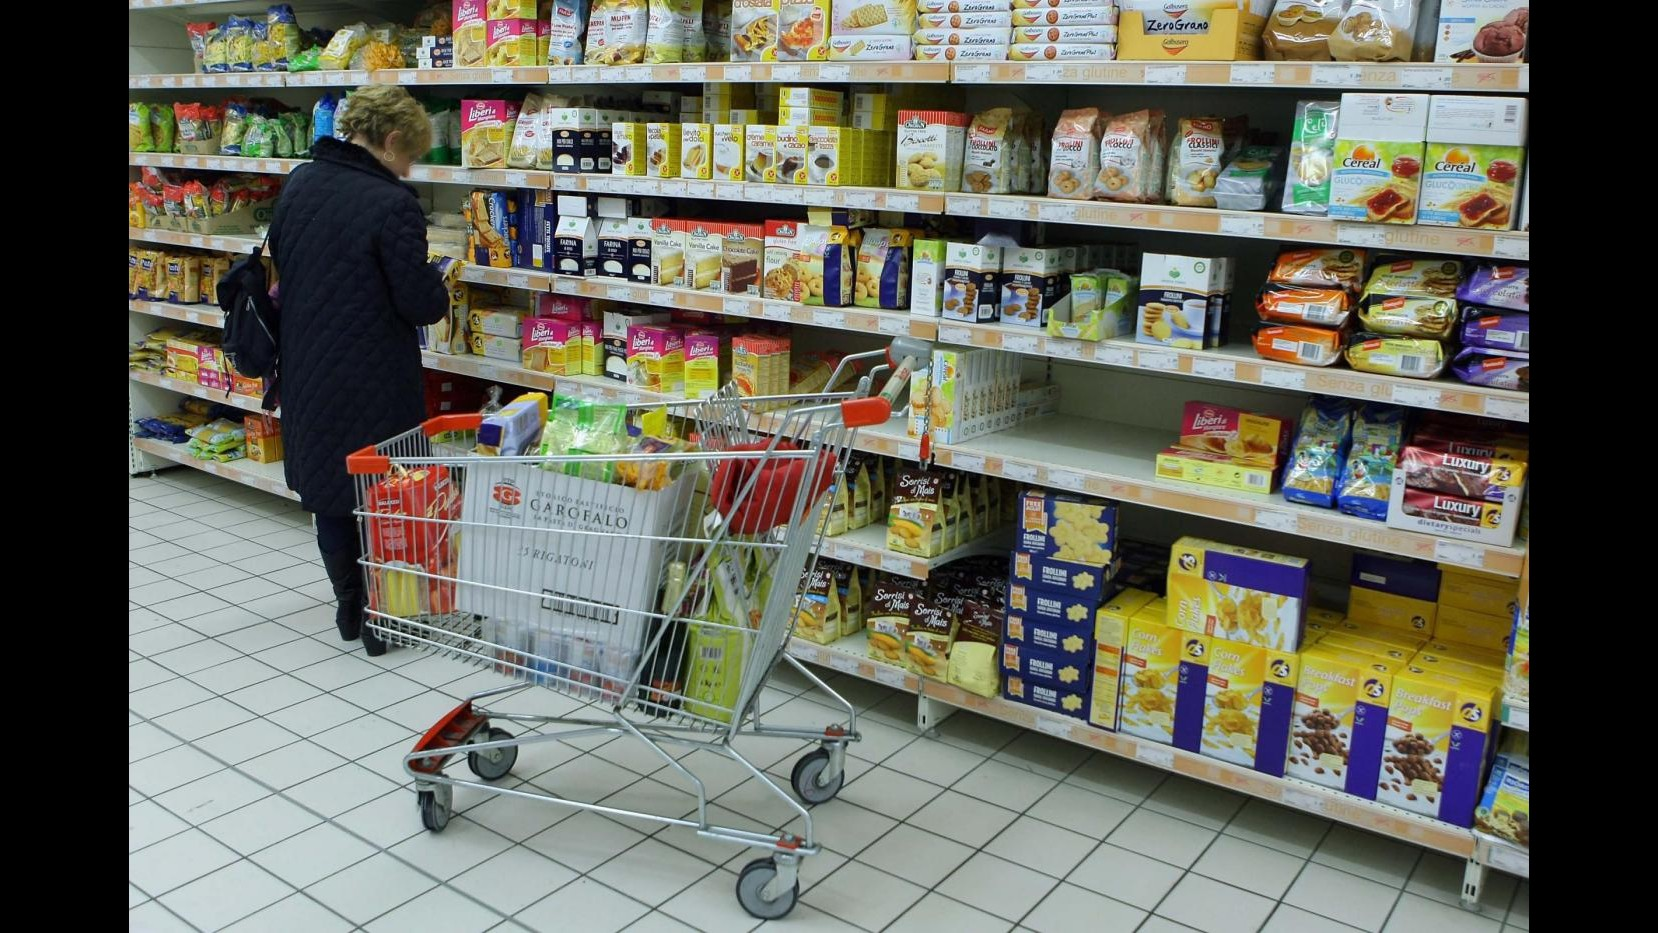 Istat: Avanzo commerciale export Paesi extra-Ue settembre 1.4 mld